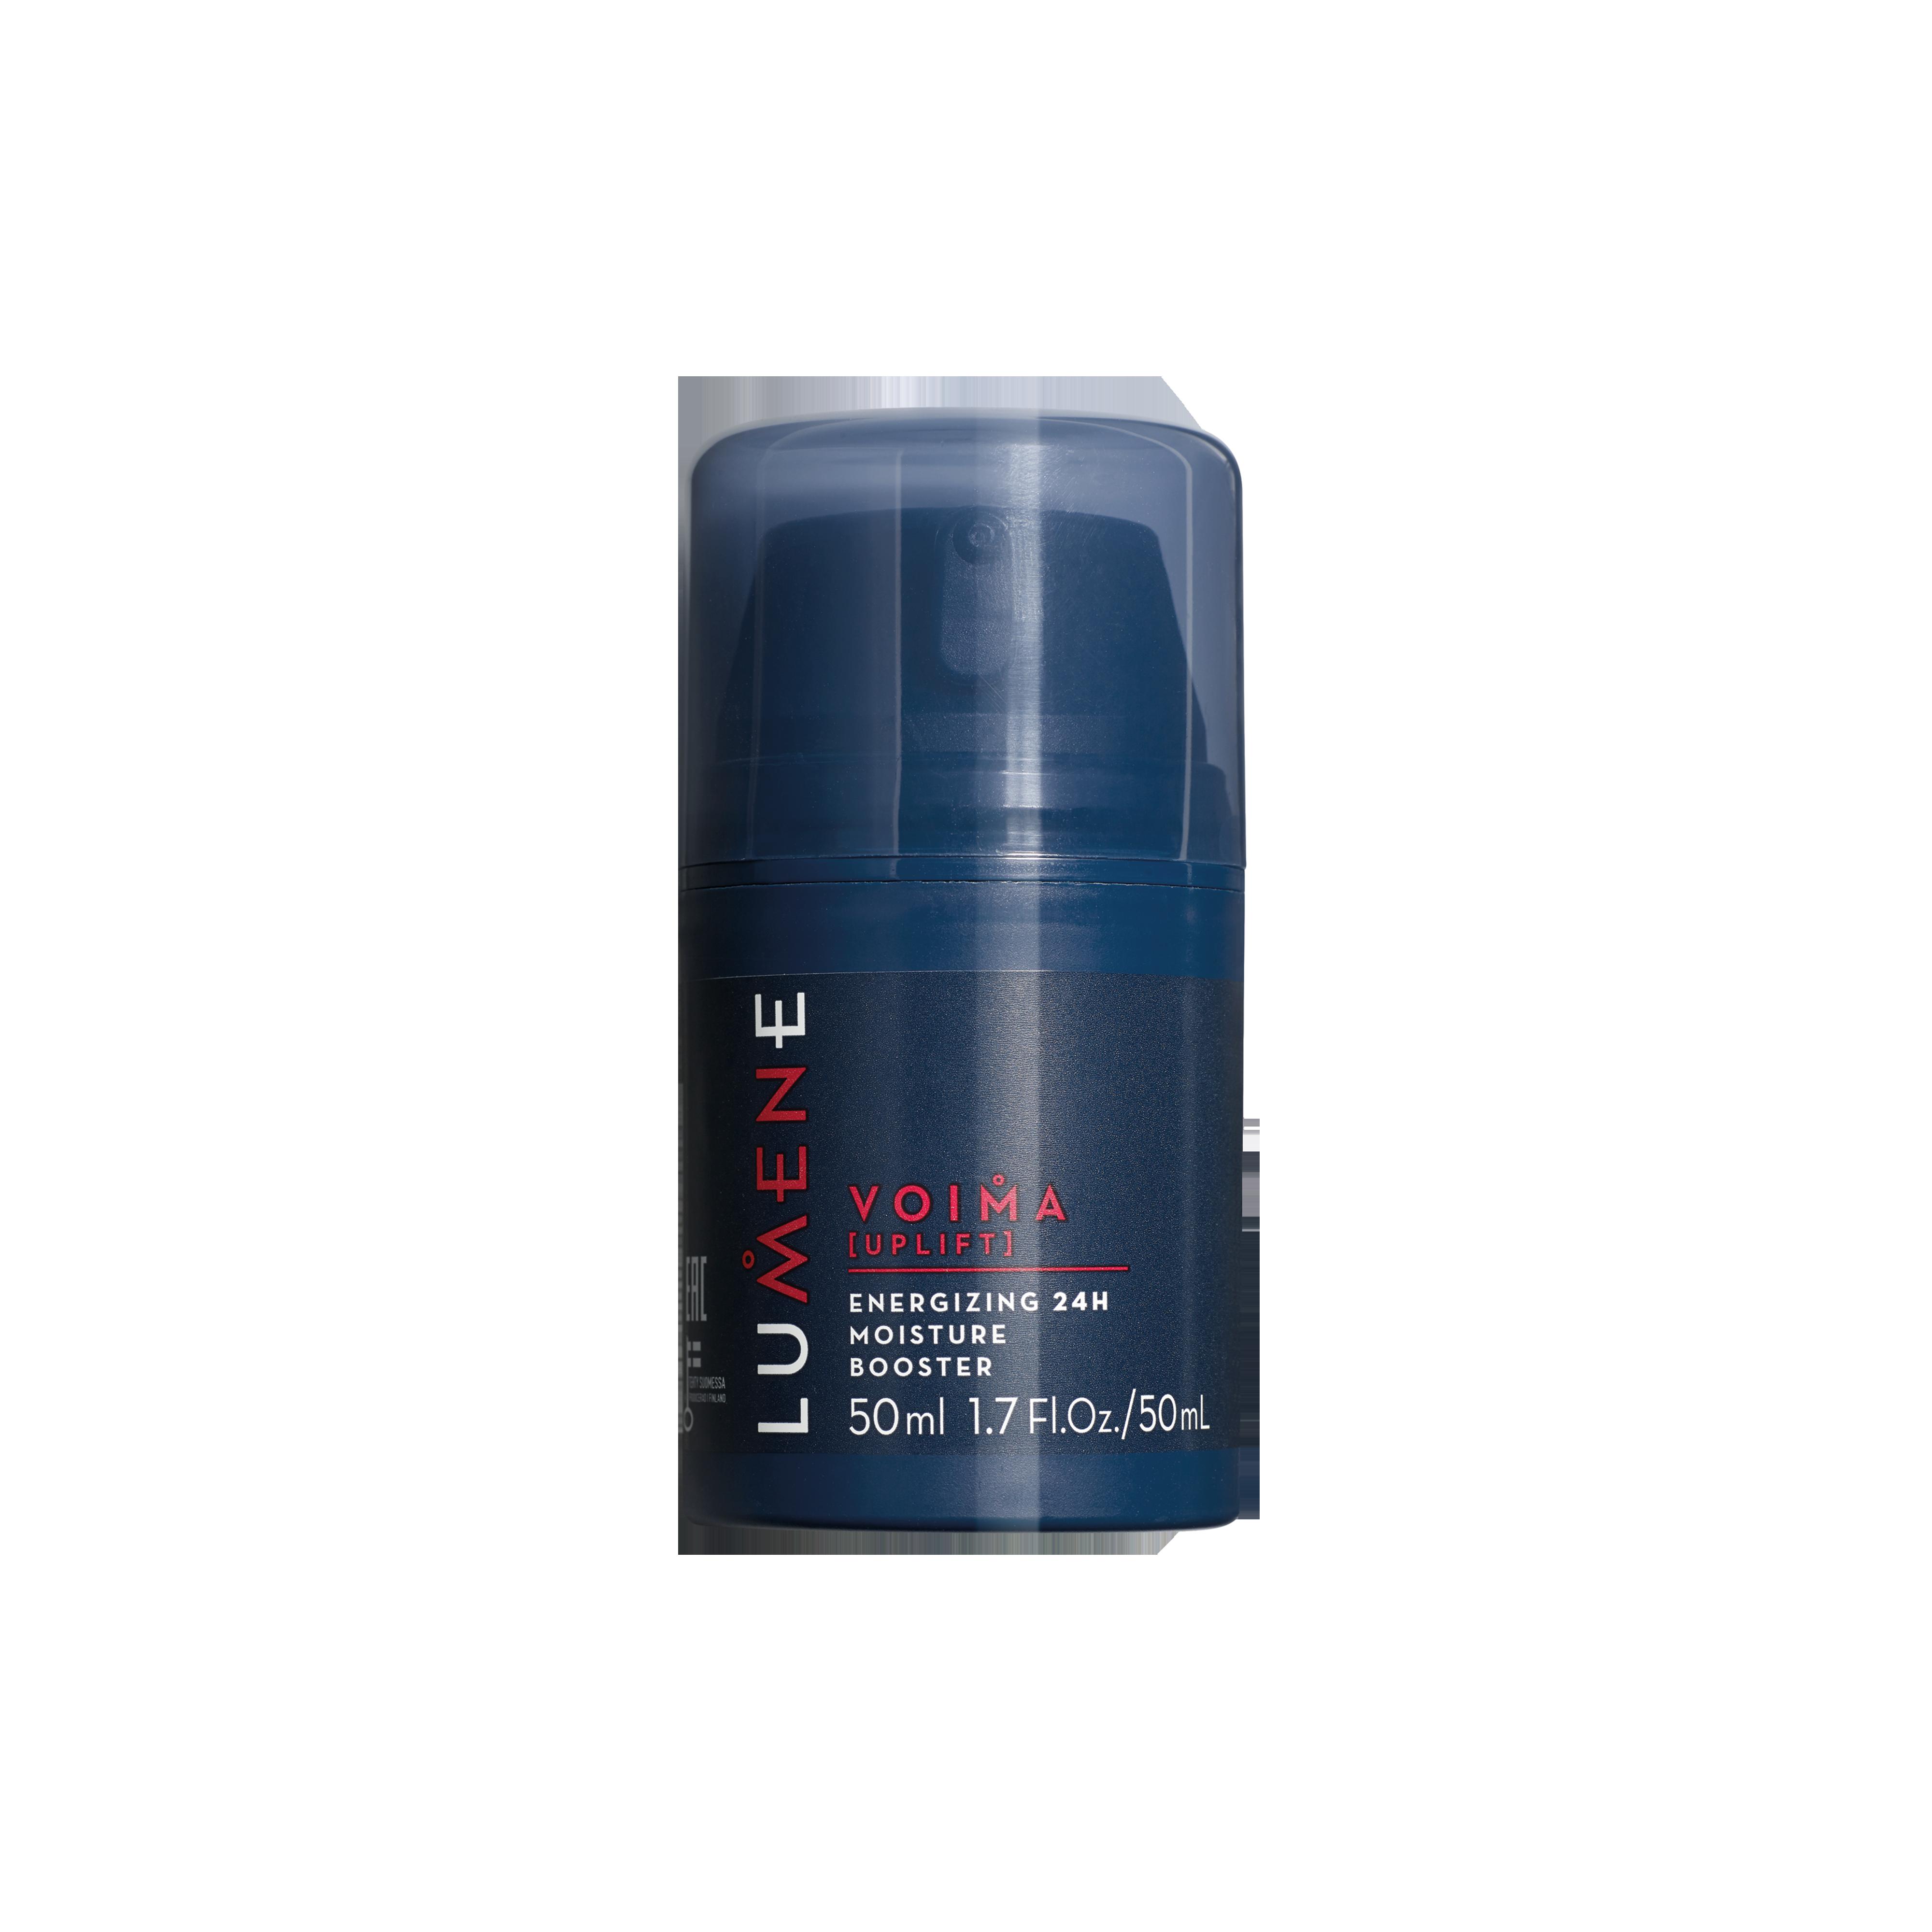 MEN VOIMA Energizing 24H Moisture Booster 50ml